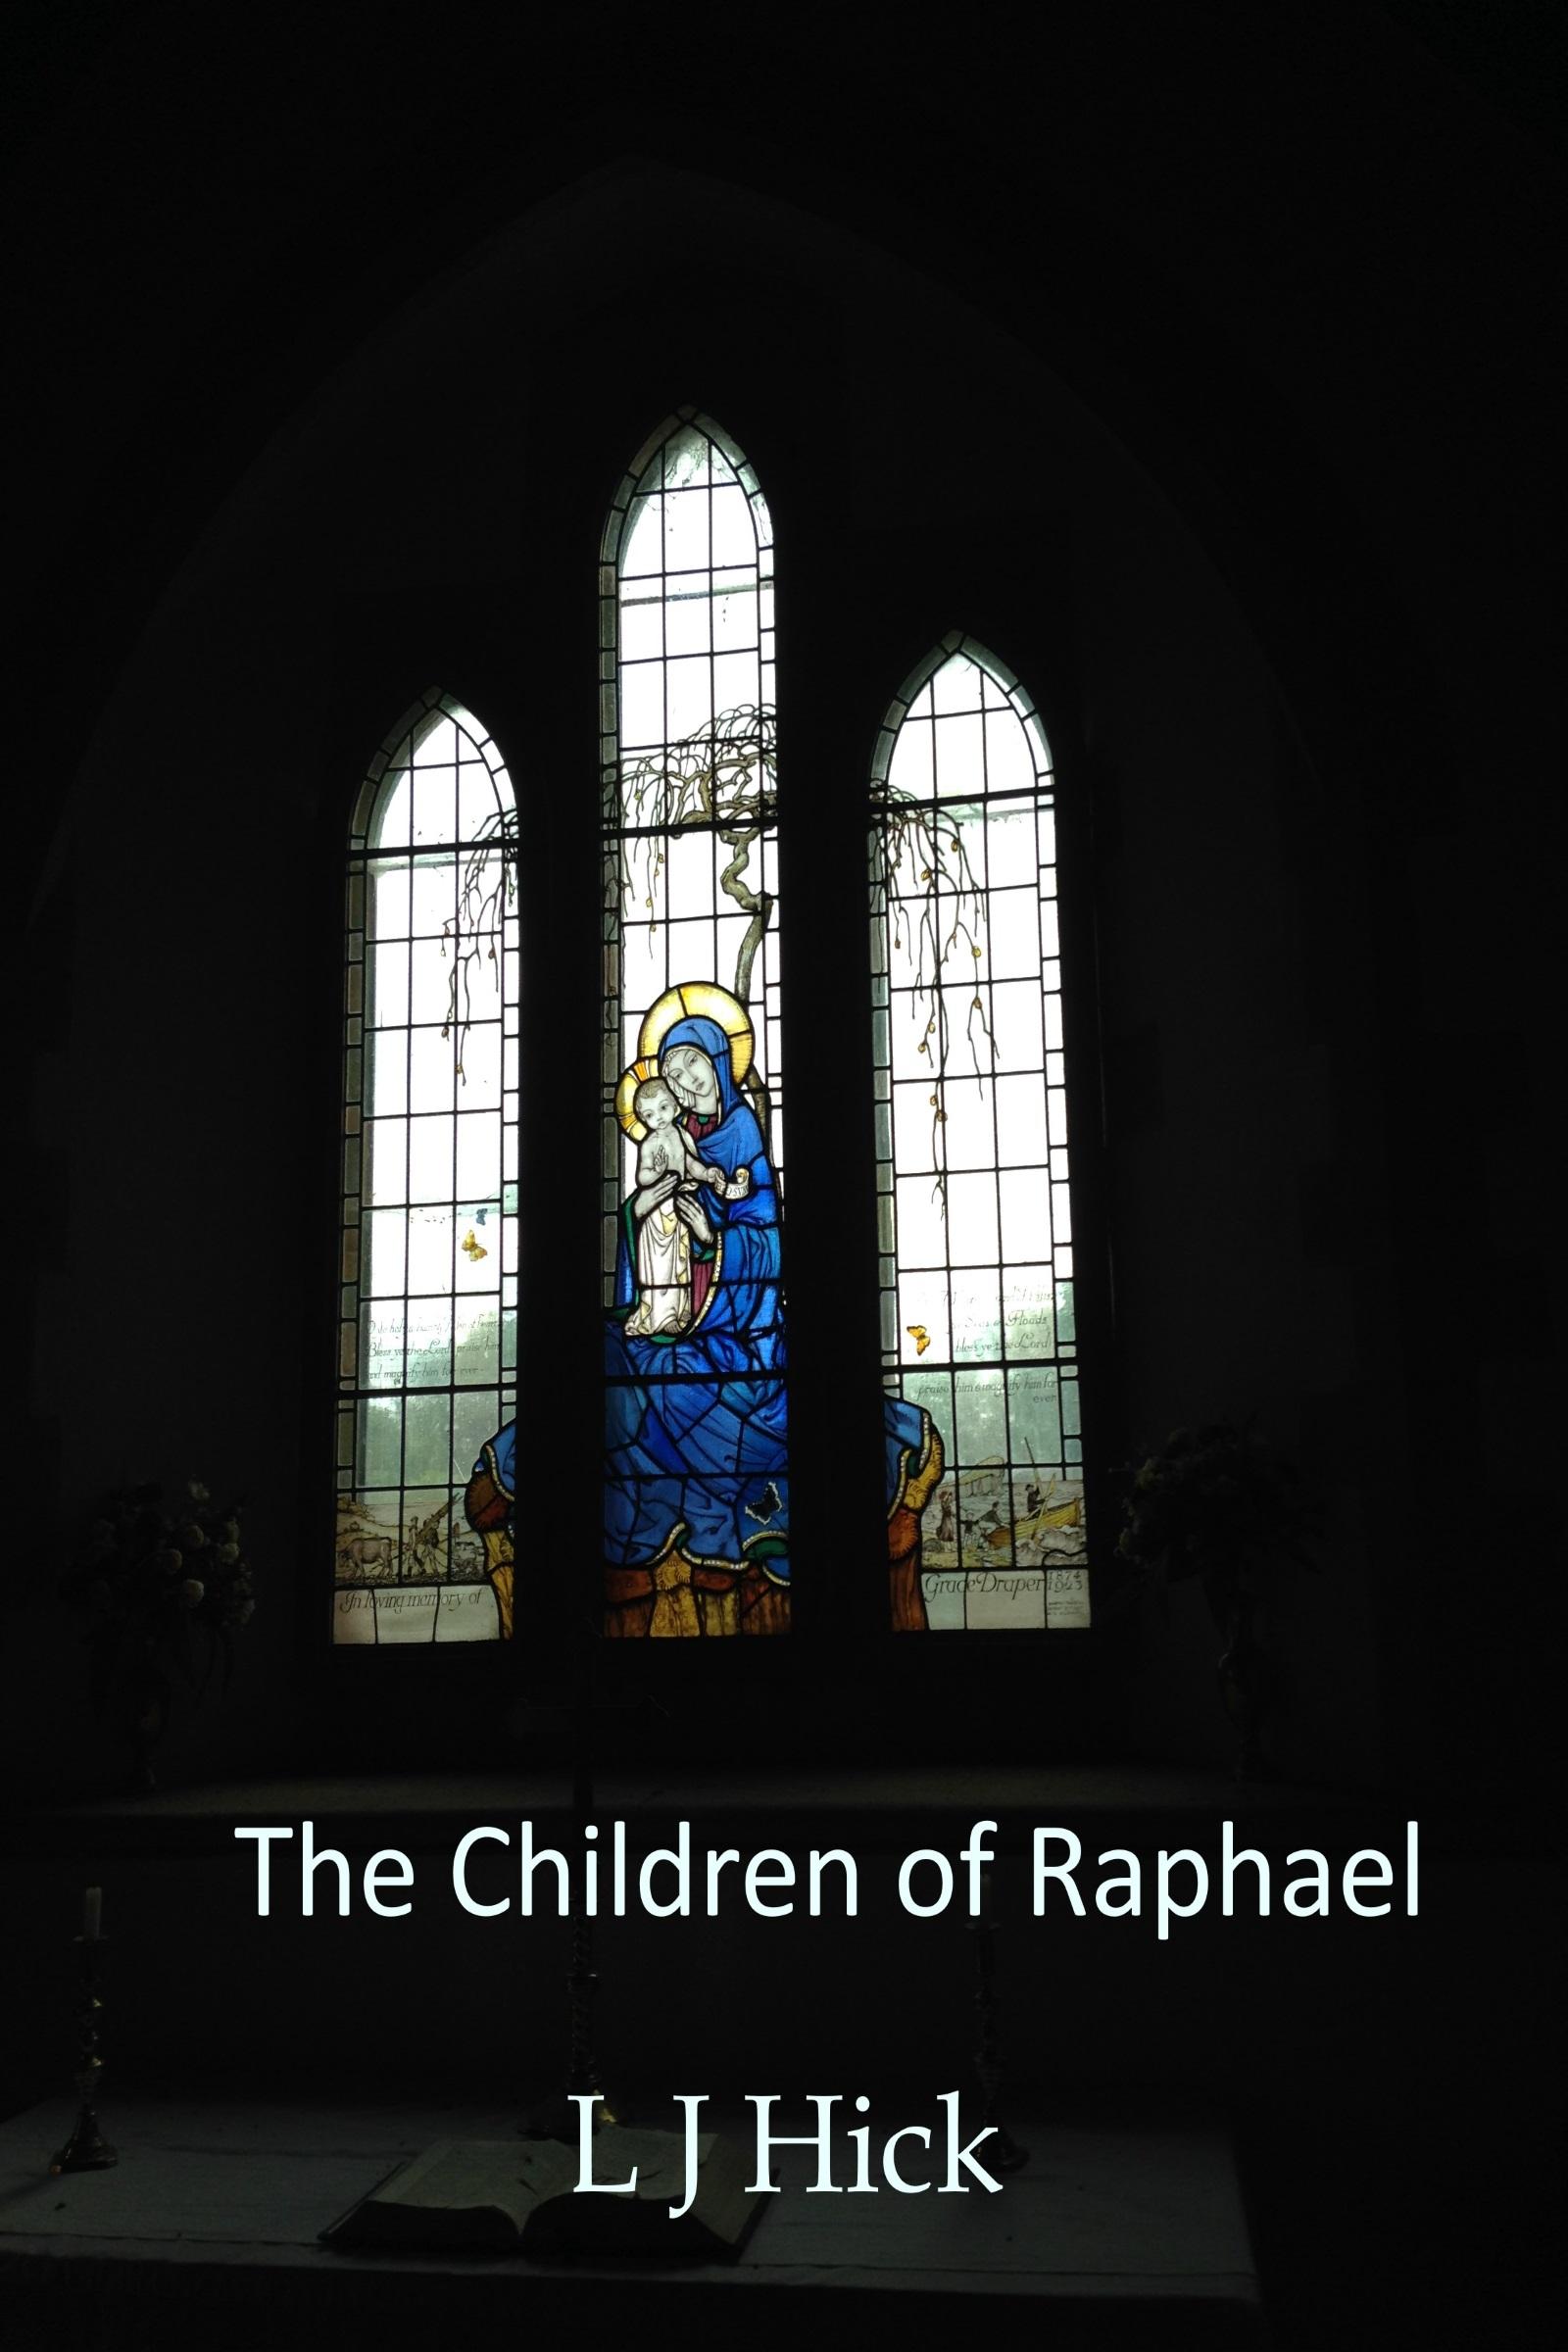 The Children of Raphael